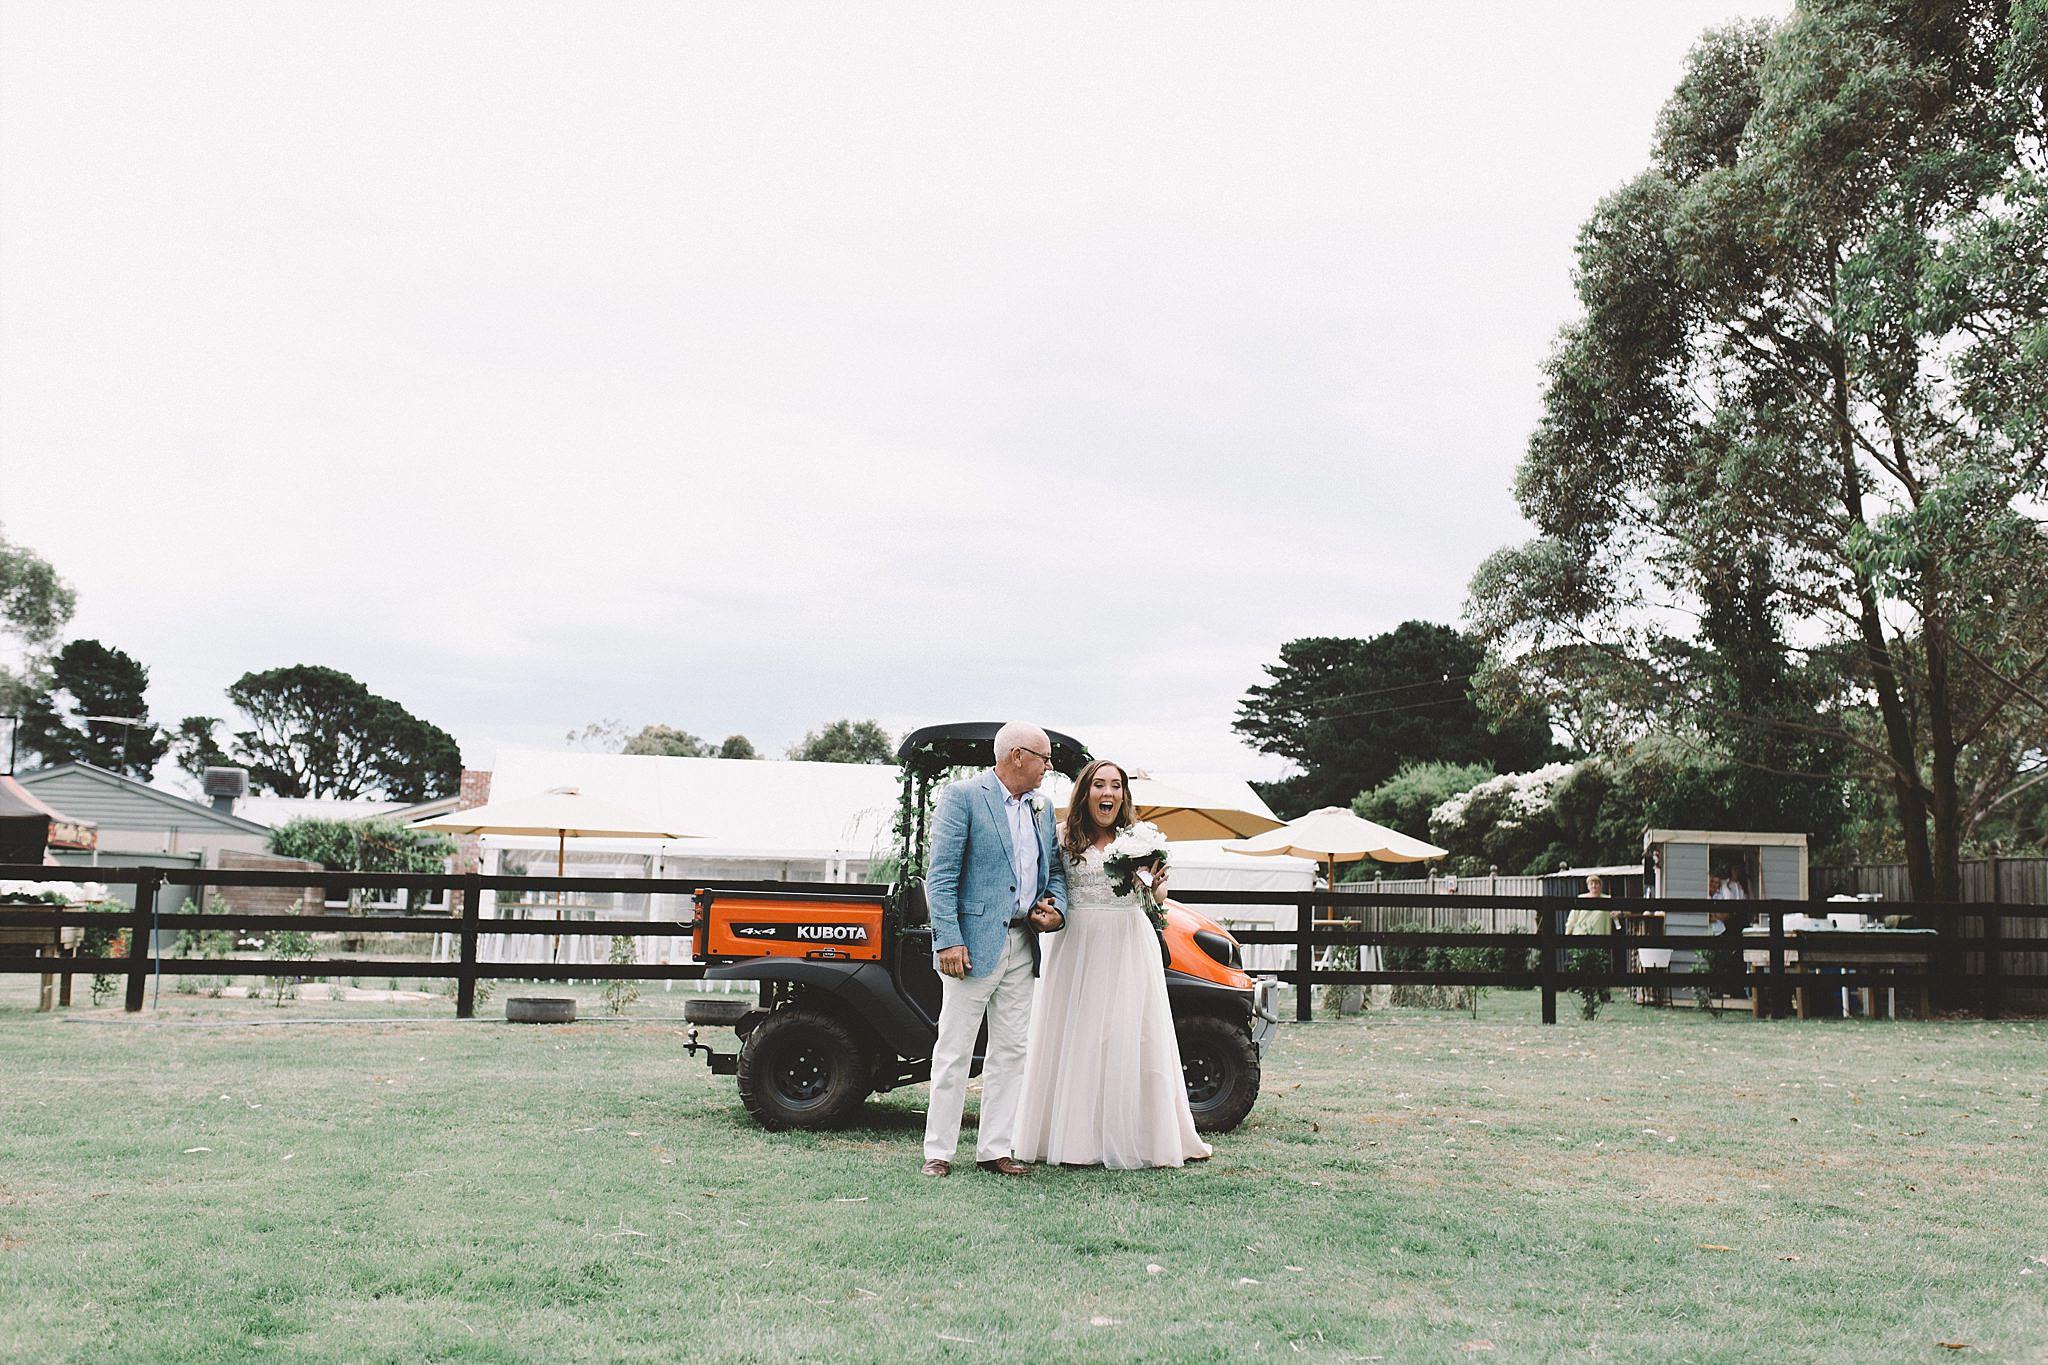 Mornington Peninsula Wedding Photographer 83.JPG